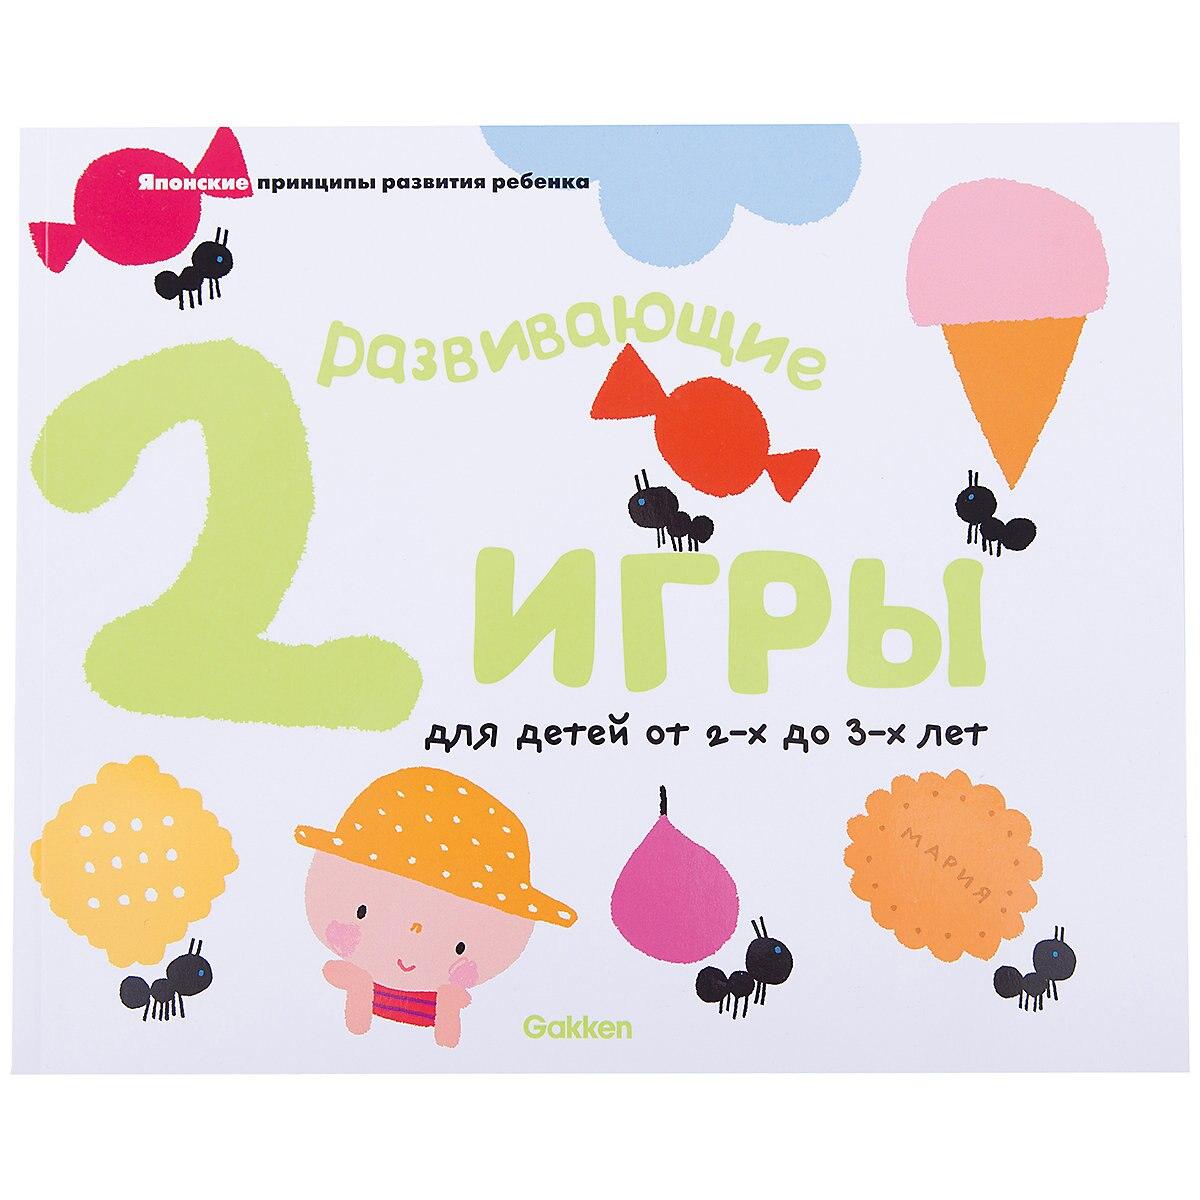 Books EKSMO 7932081 Children Education Encyclopedia Alphabet Dictionary Book For Baby MTpromo